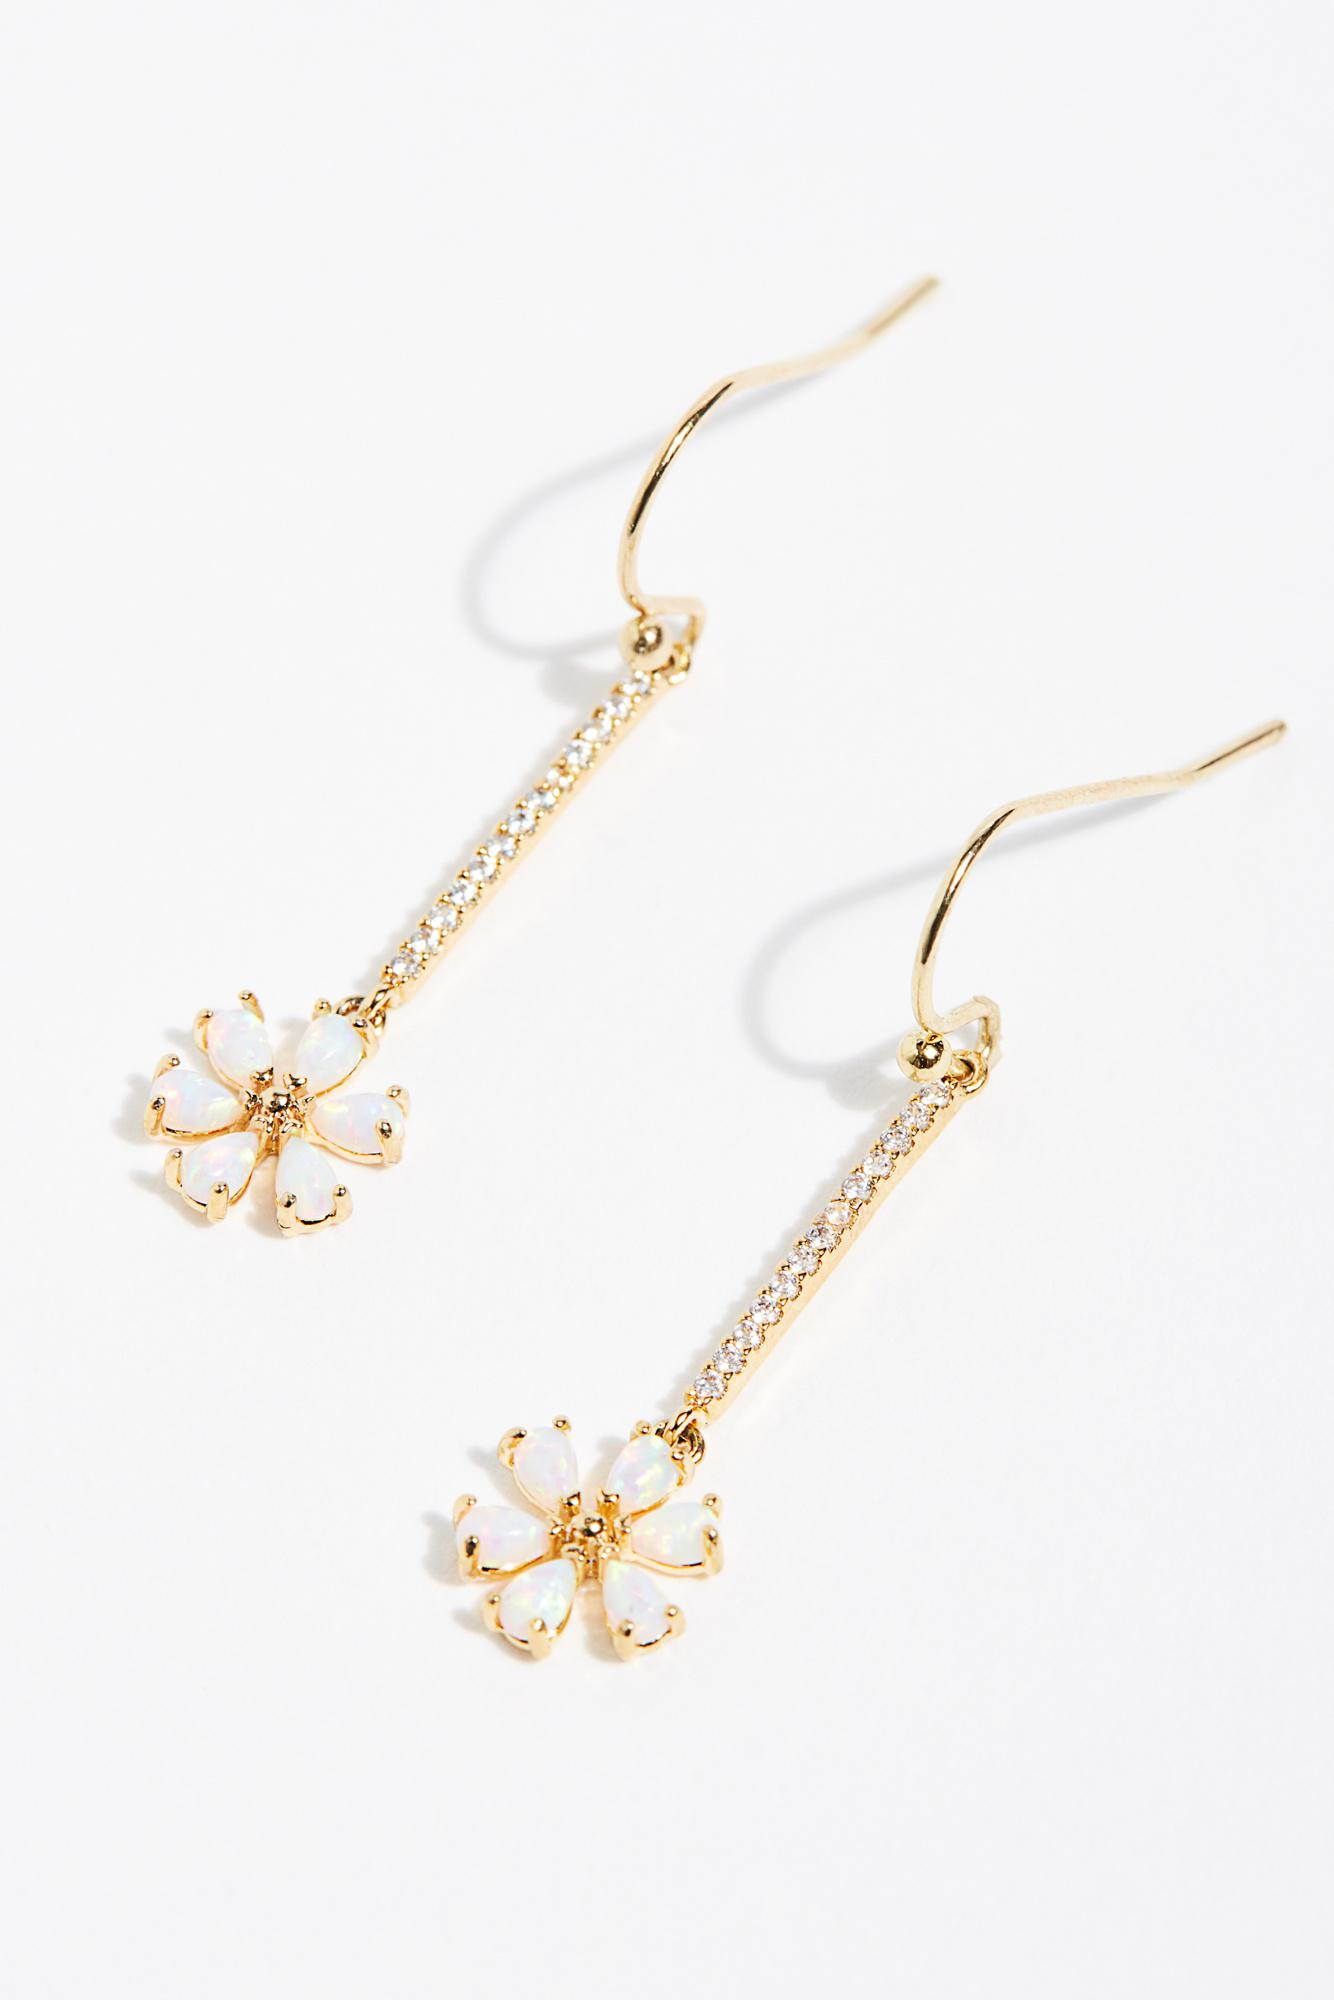 Free People Women S Metallic Tai Daisy Drop Threader Earrings